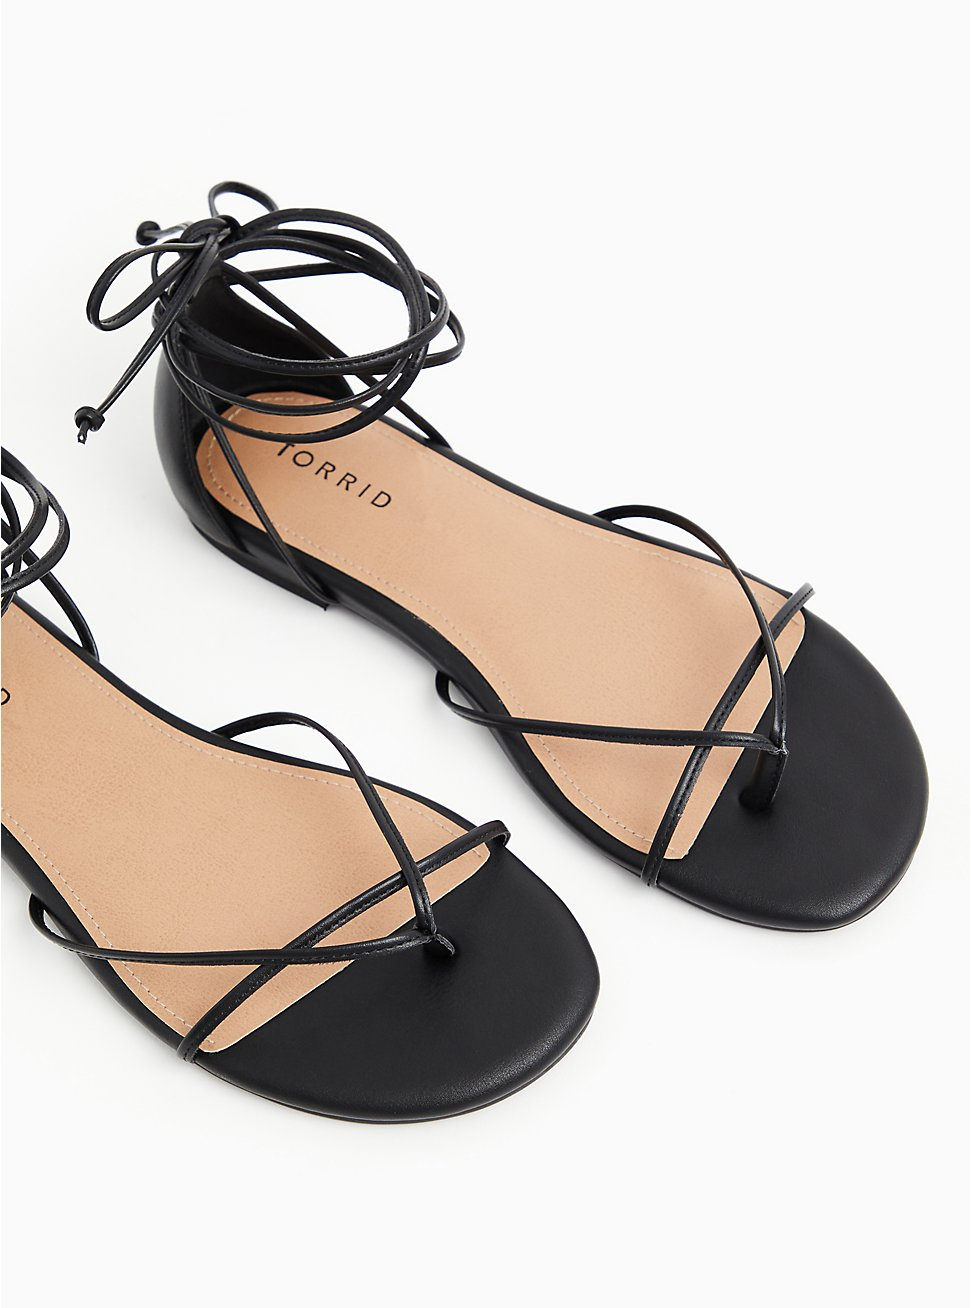 Black Faux Leather Ankle Wrap Gladiator Sandal (WW), BLACK, hi-res